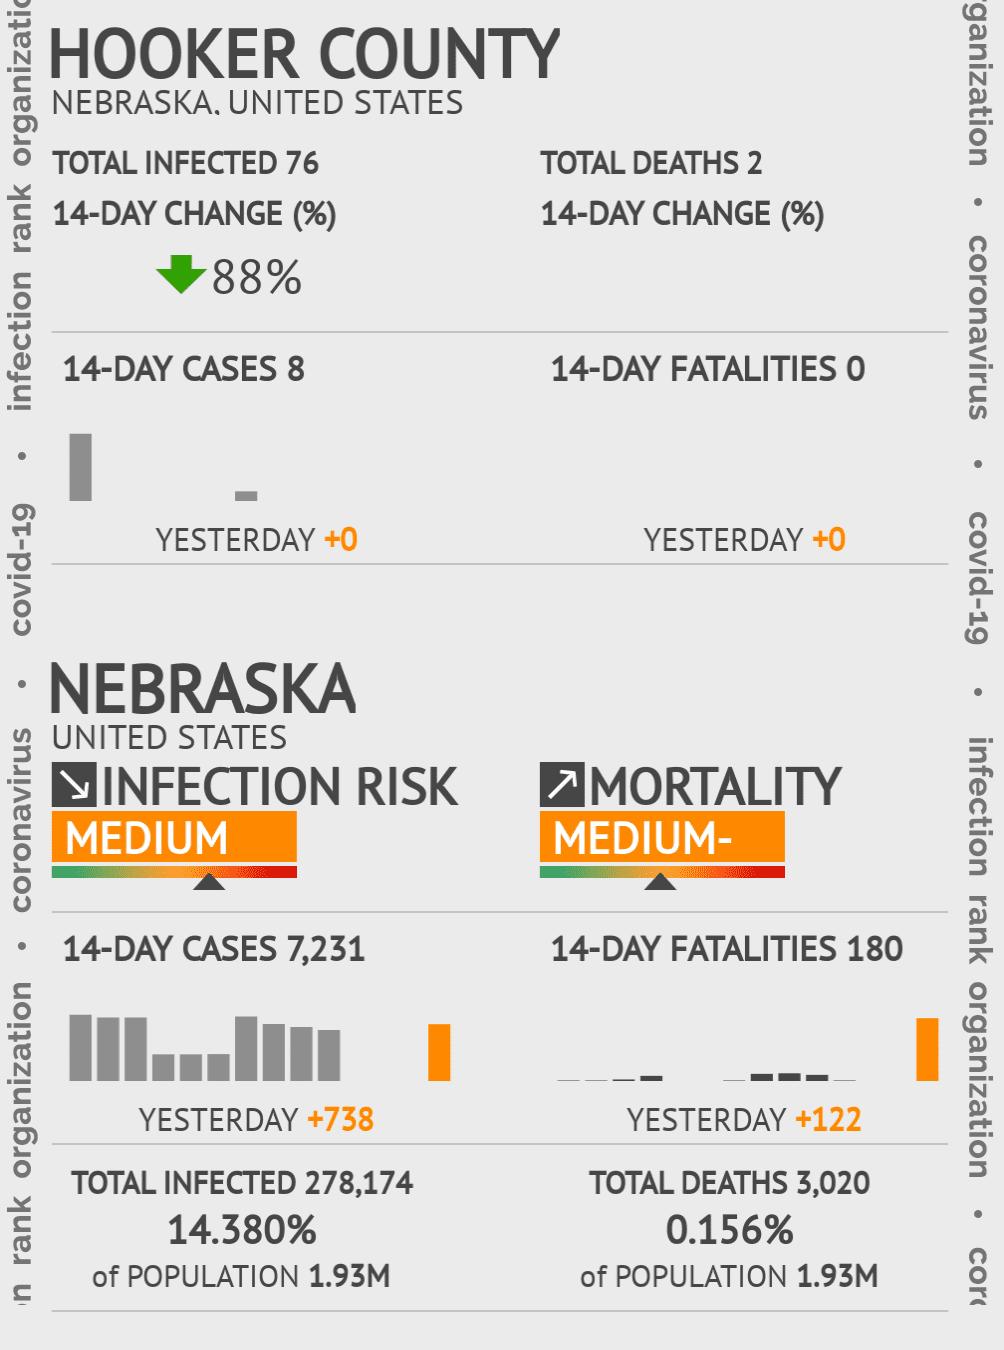 Hooker County Coronavirus Covid-19 Risk of Infection on July 24, 2021